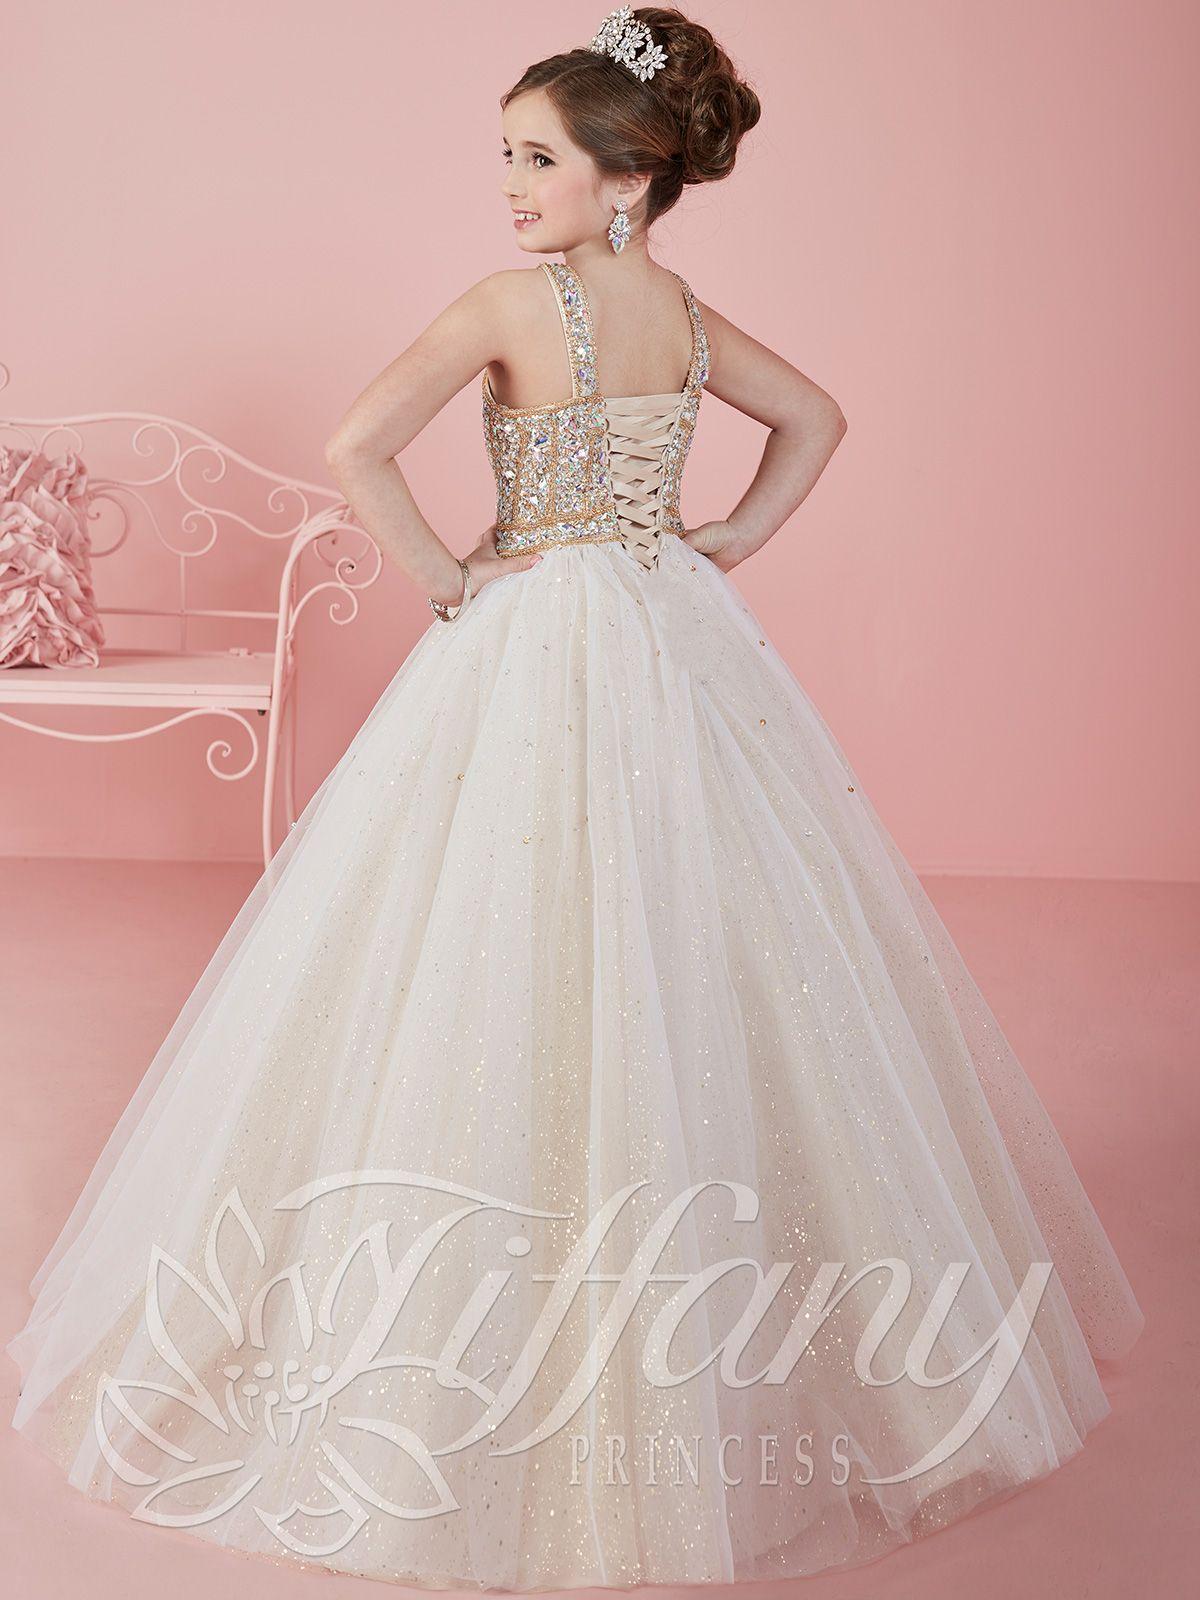 Tiffany Princess 13462 Scoop Neckline Pageant Dress | pageant ...